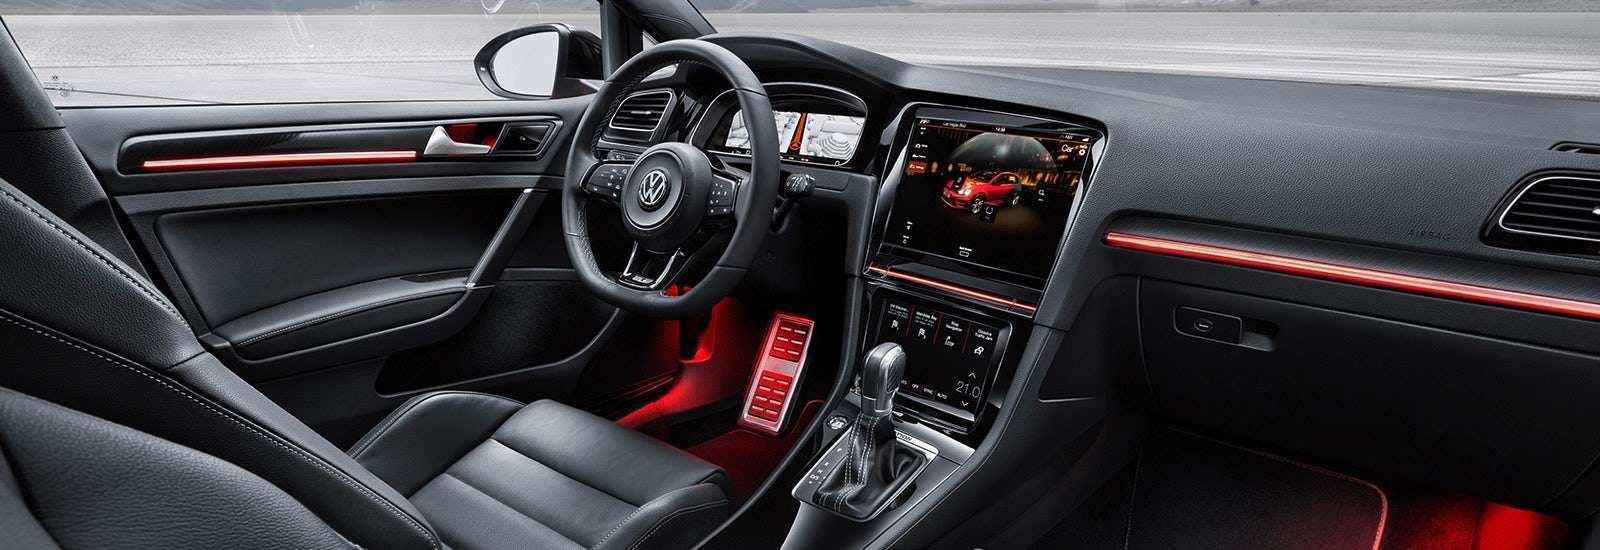 25 New 2019 Volkswagen Gti Release Date Research New for 2019 Volkswagen Gti Release Date